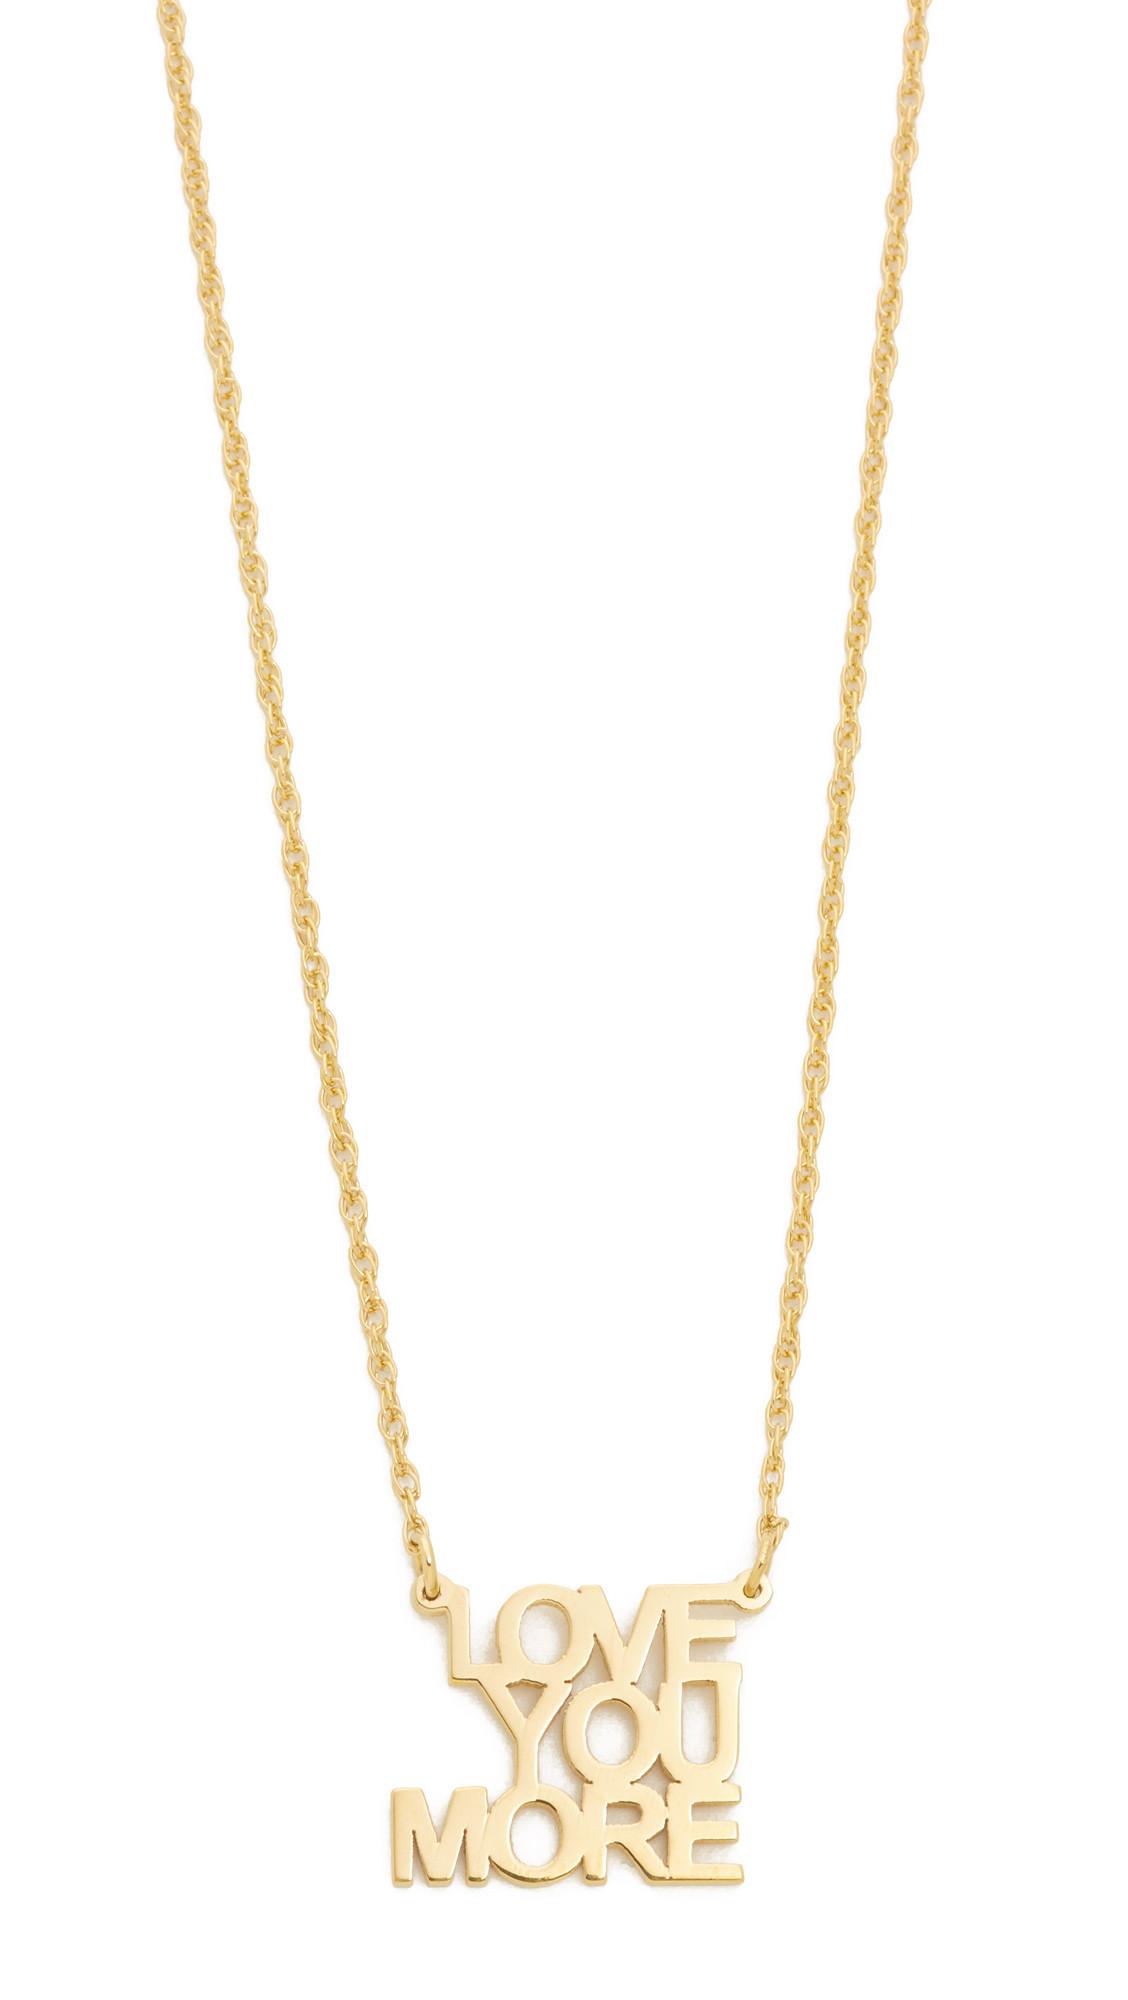 daea945aa Jennifer Zeuner Jewelry Love You More Necklace - Gold